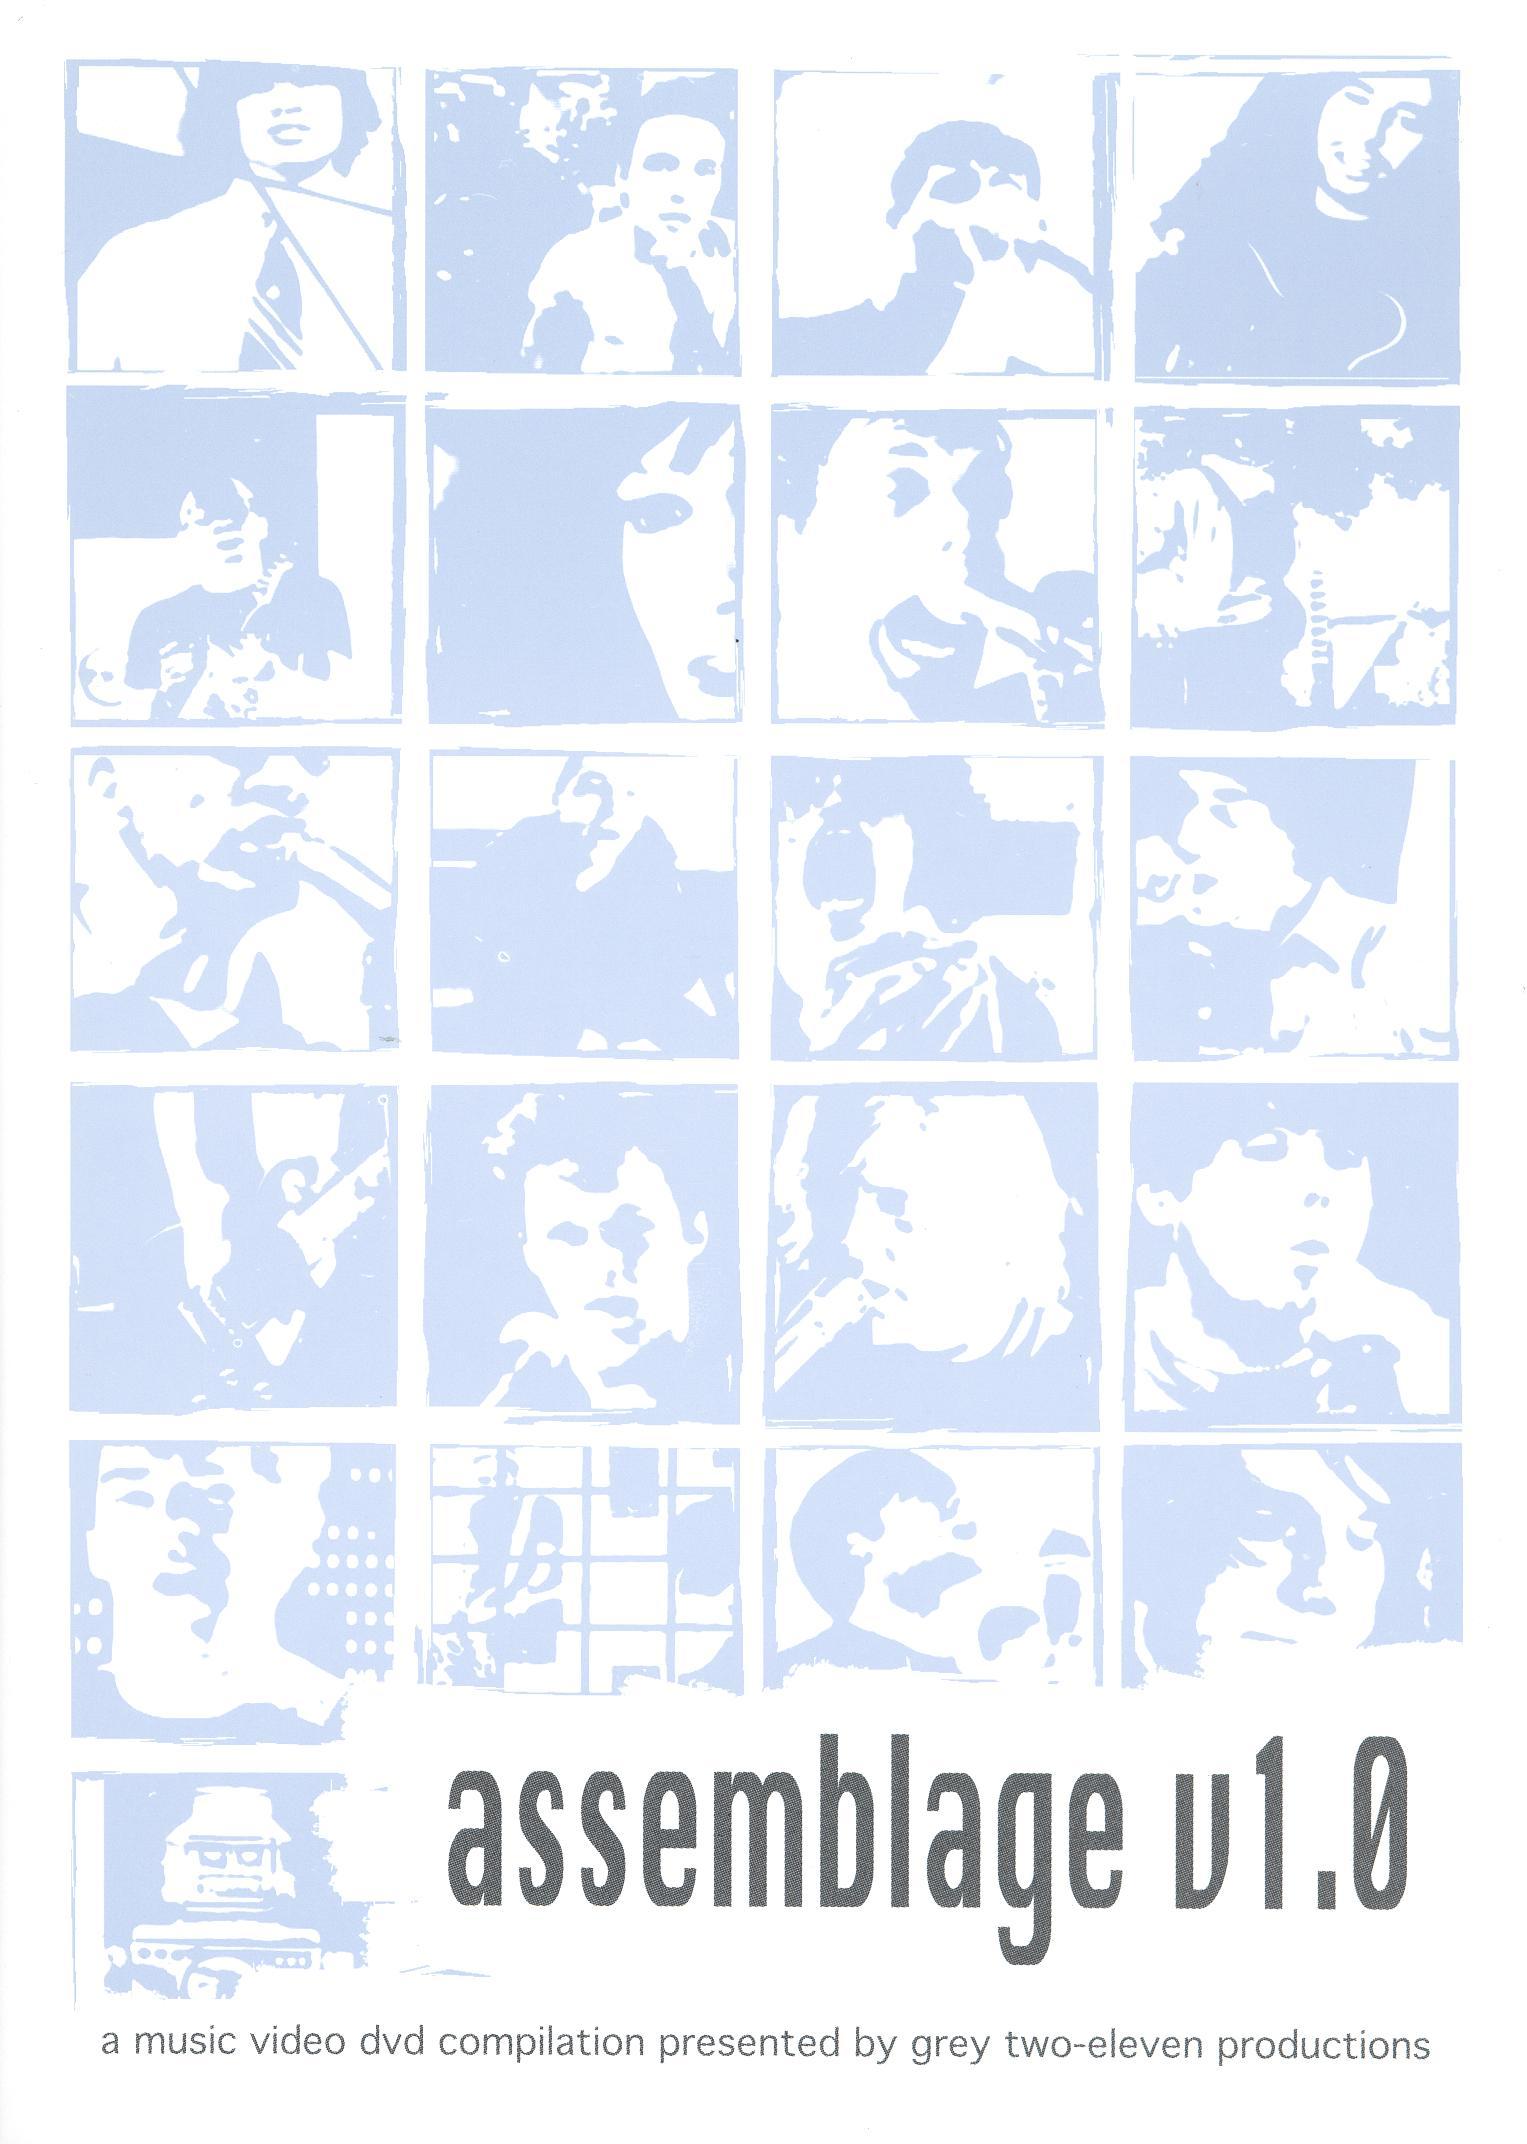 Assemblage, Vol. 1.0